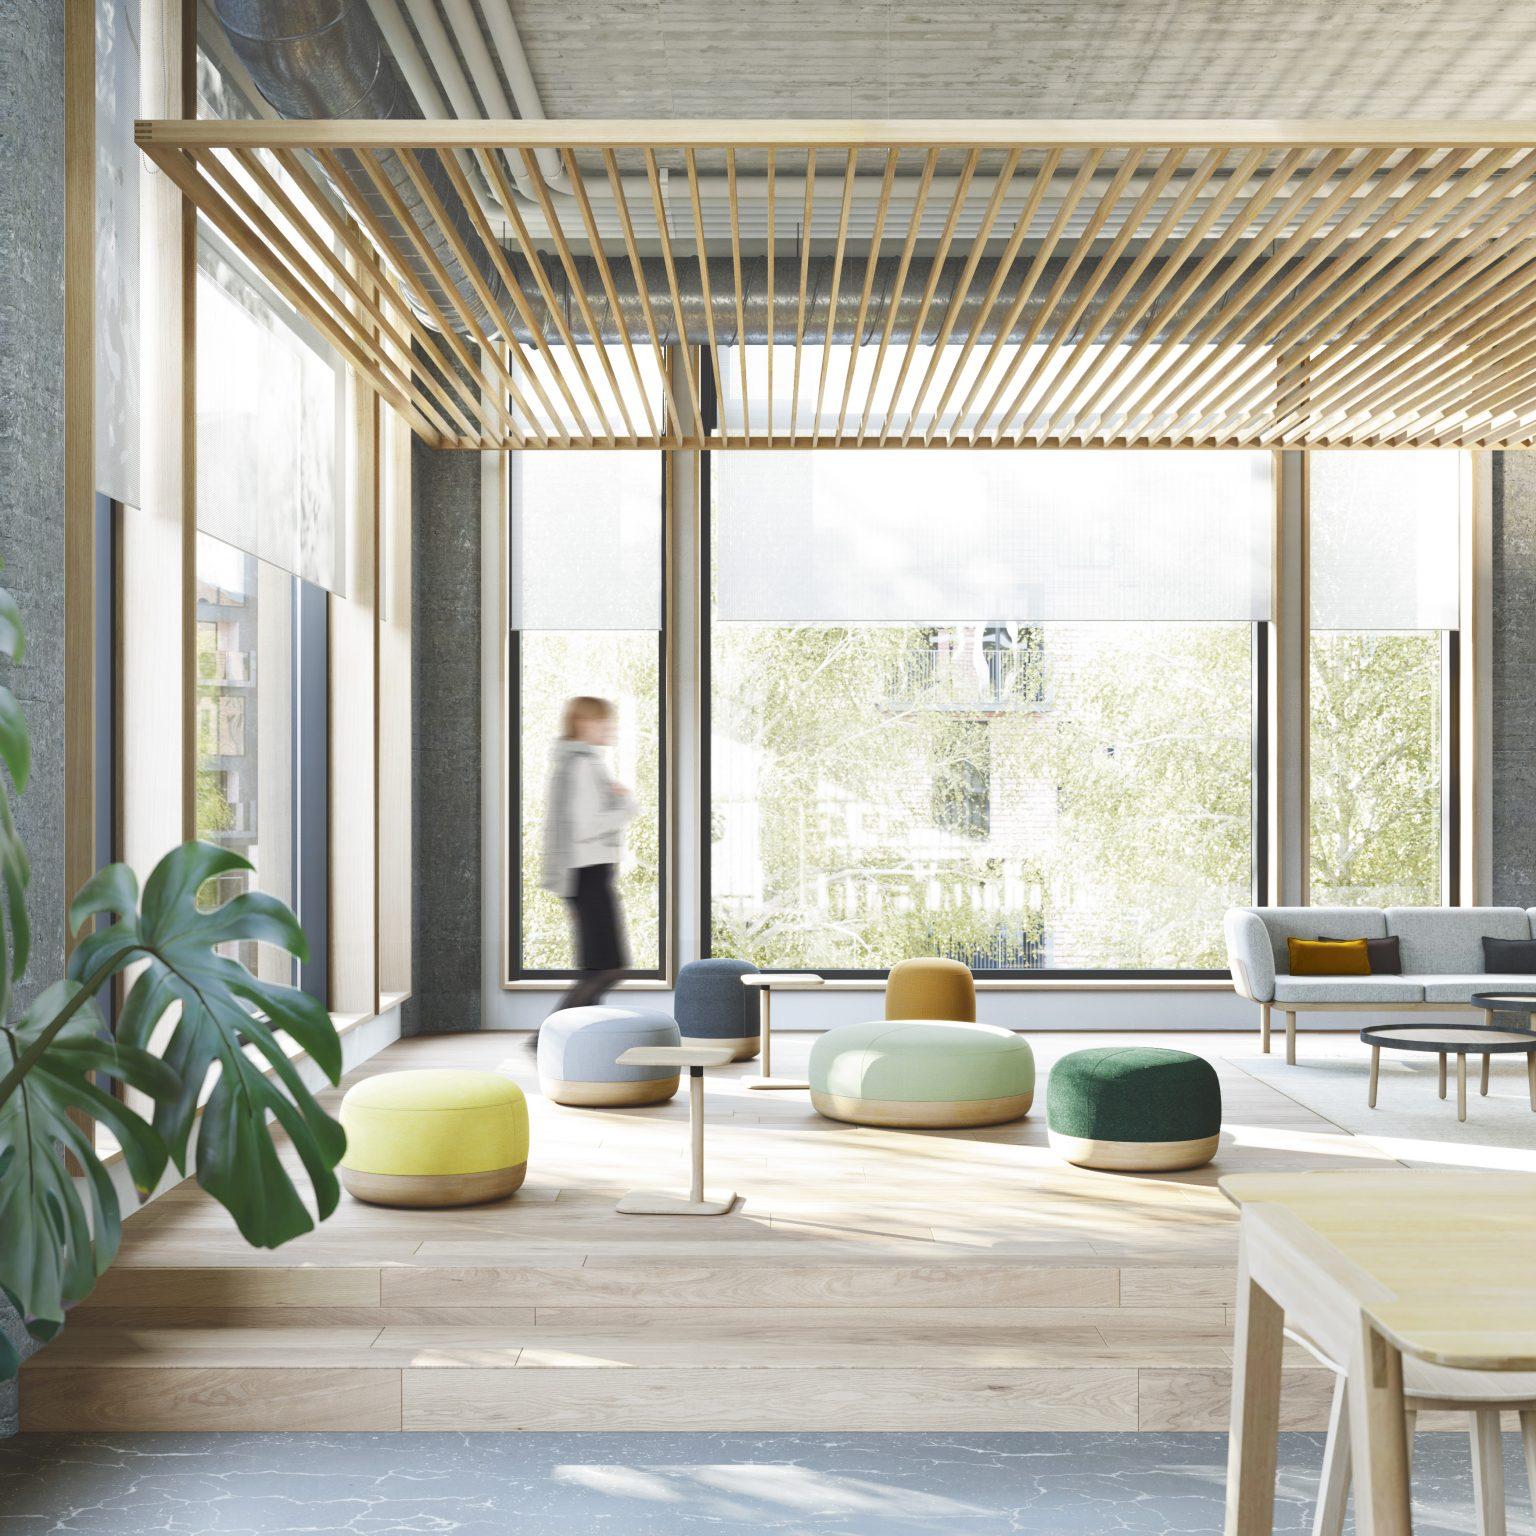 Biennale Interieur - Belgium's leading design and interior event - Alki-work-installation-15.jpg